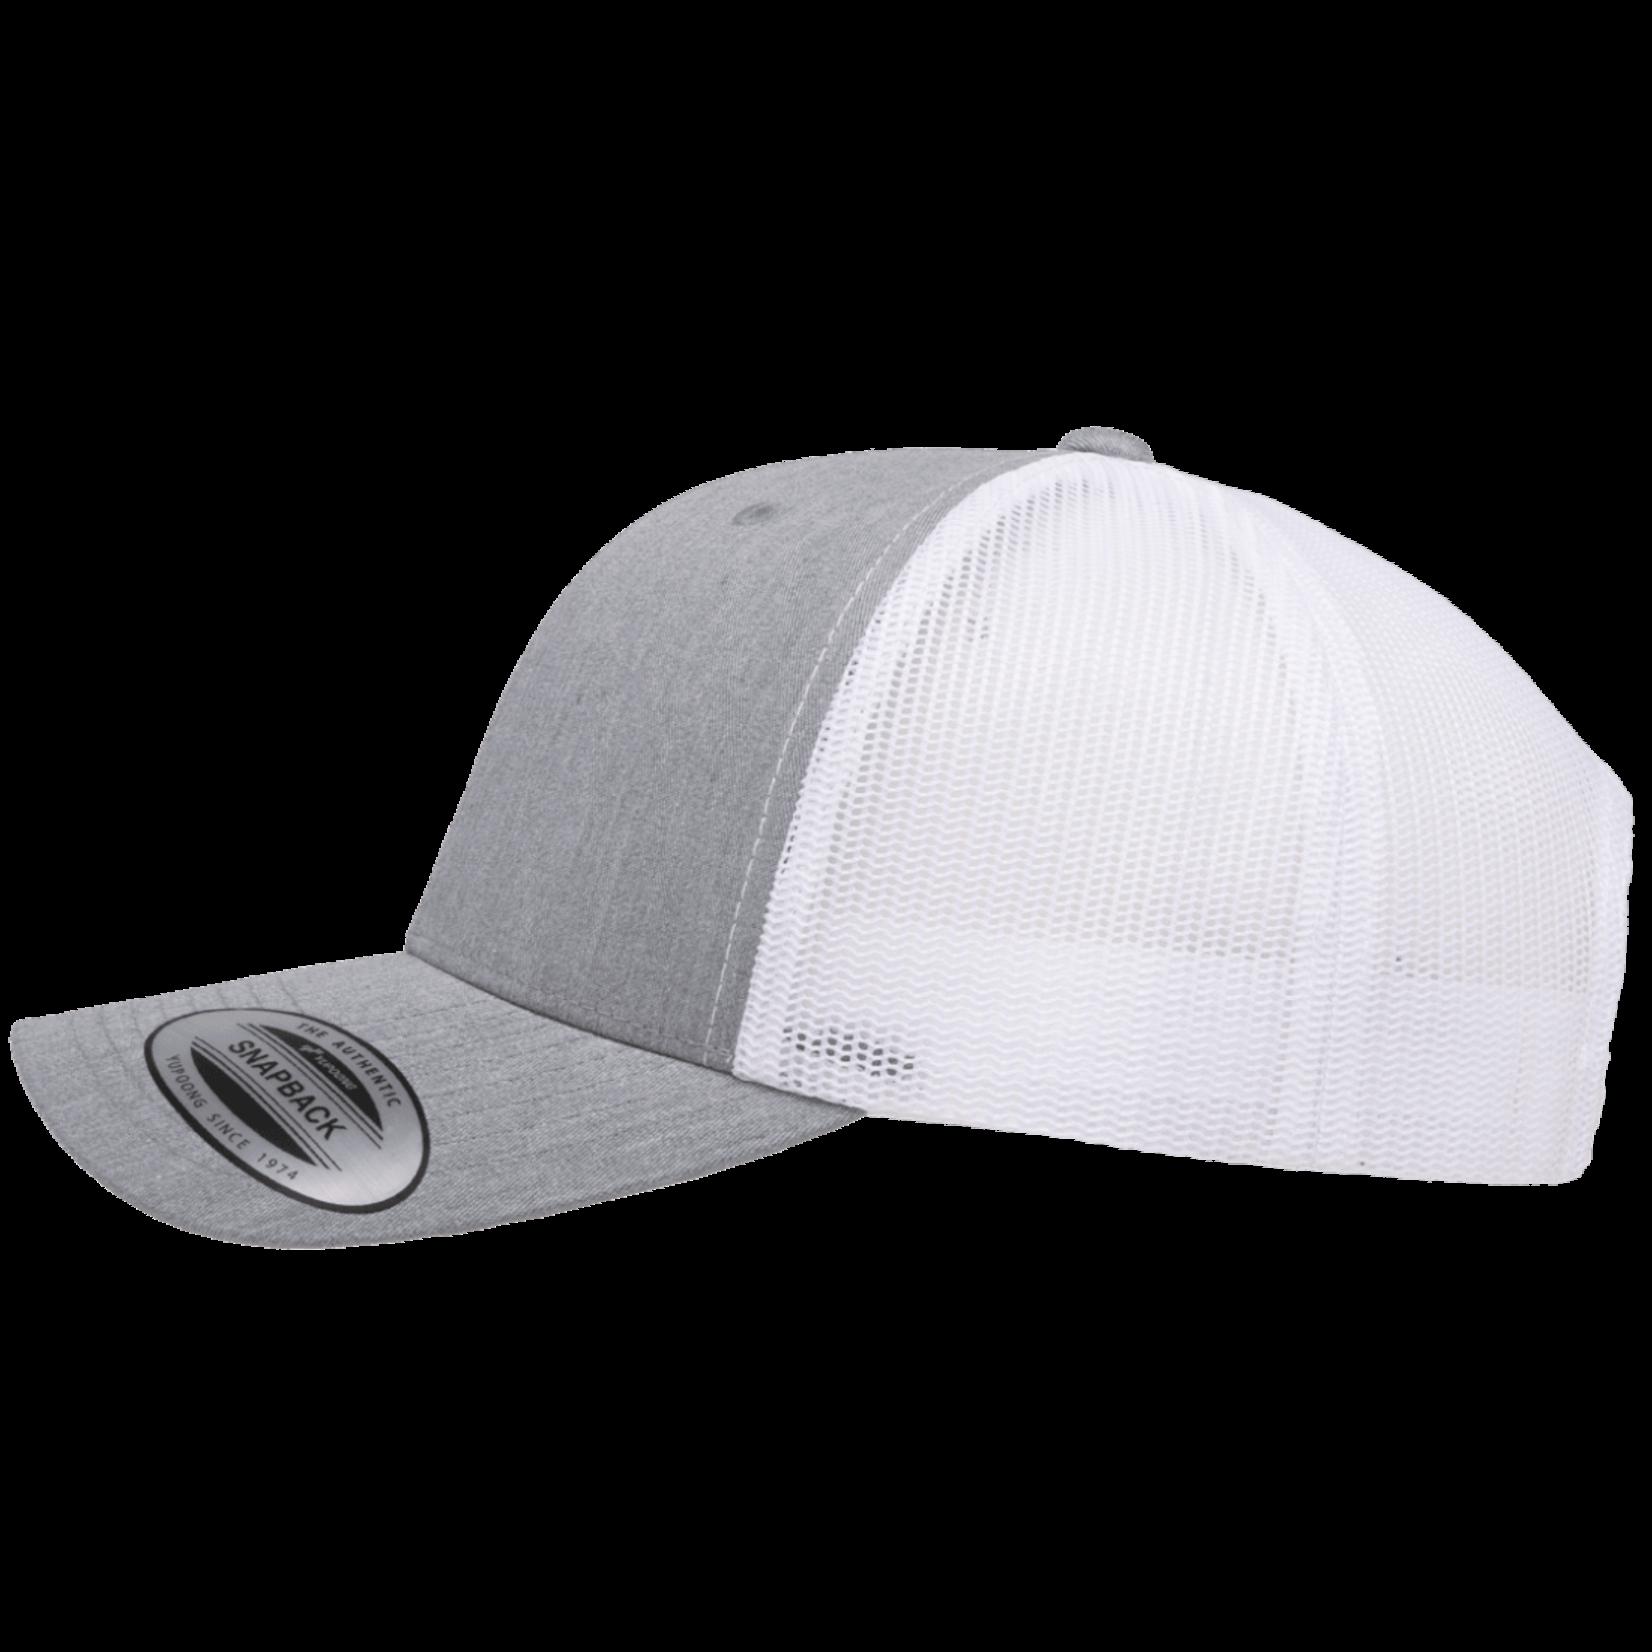 Flexfit Flexfit 6606T 2-Tone Snapback Trucker Hat - Heather Grey/White